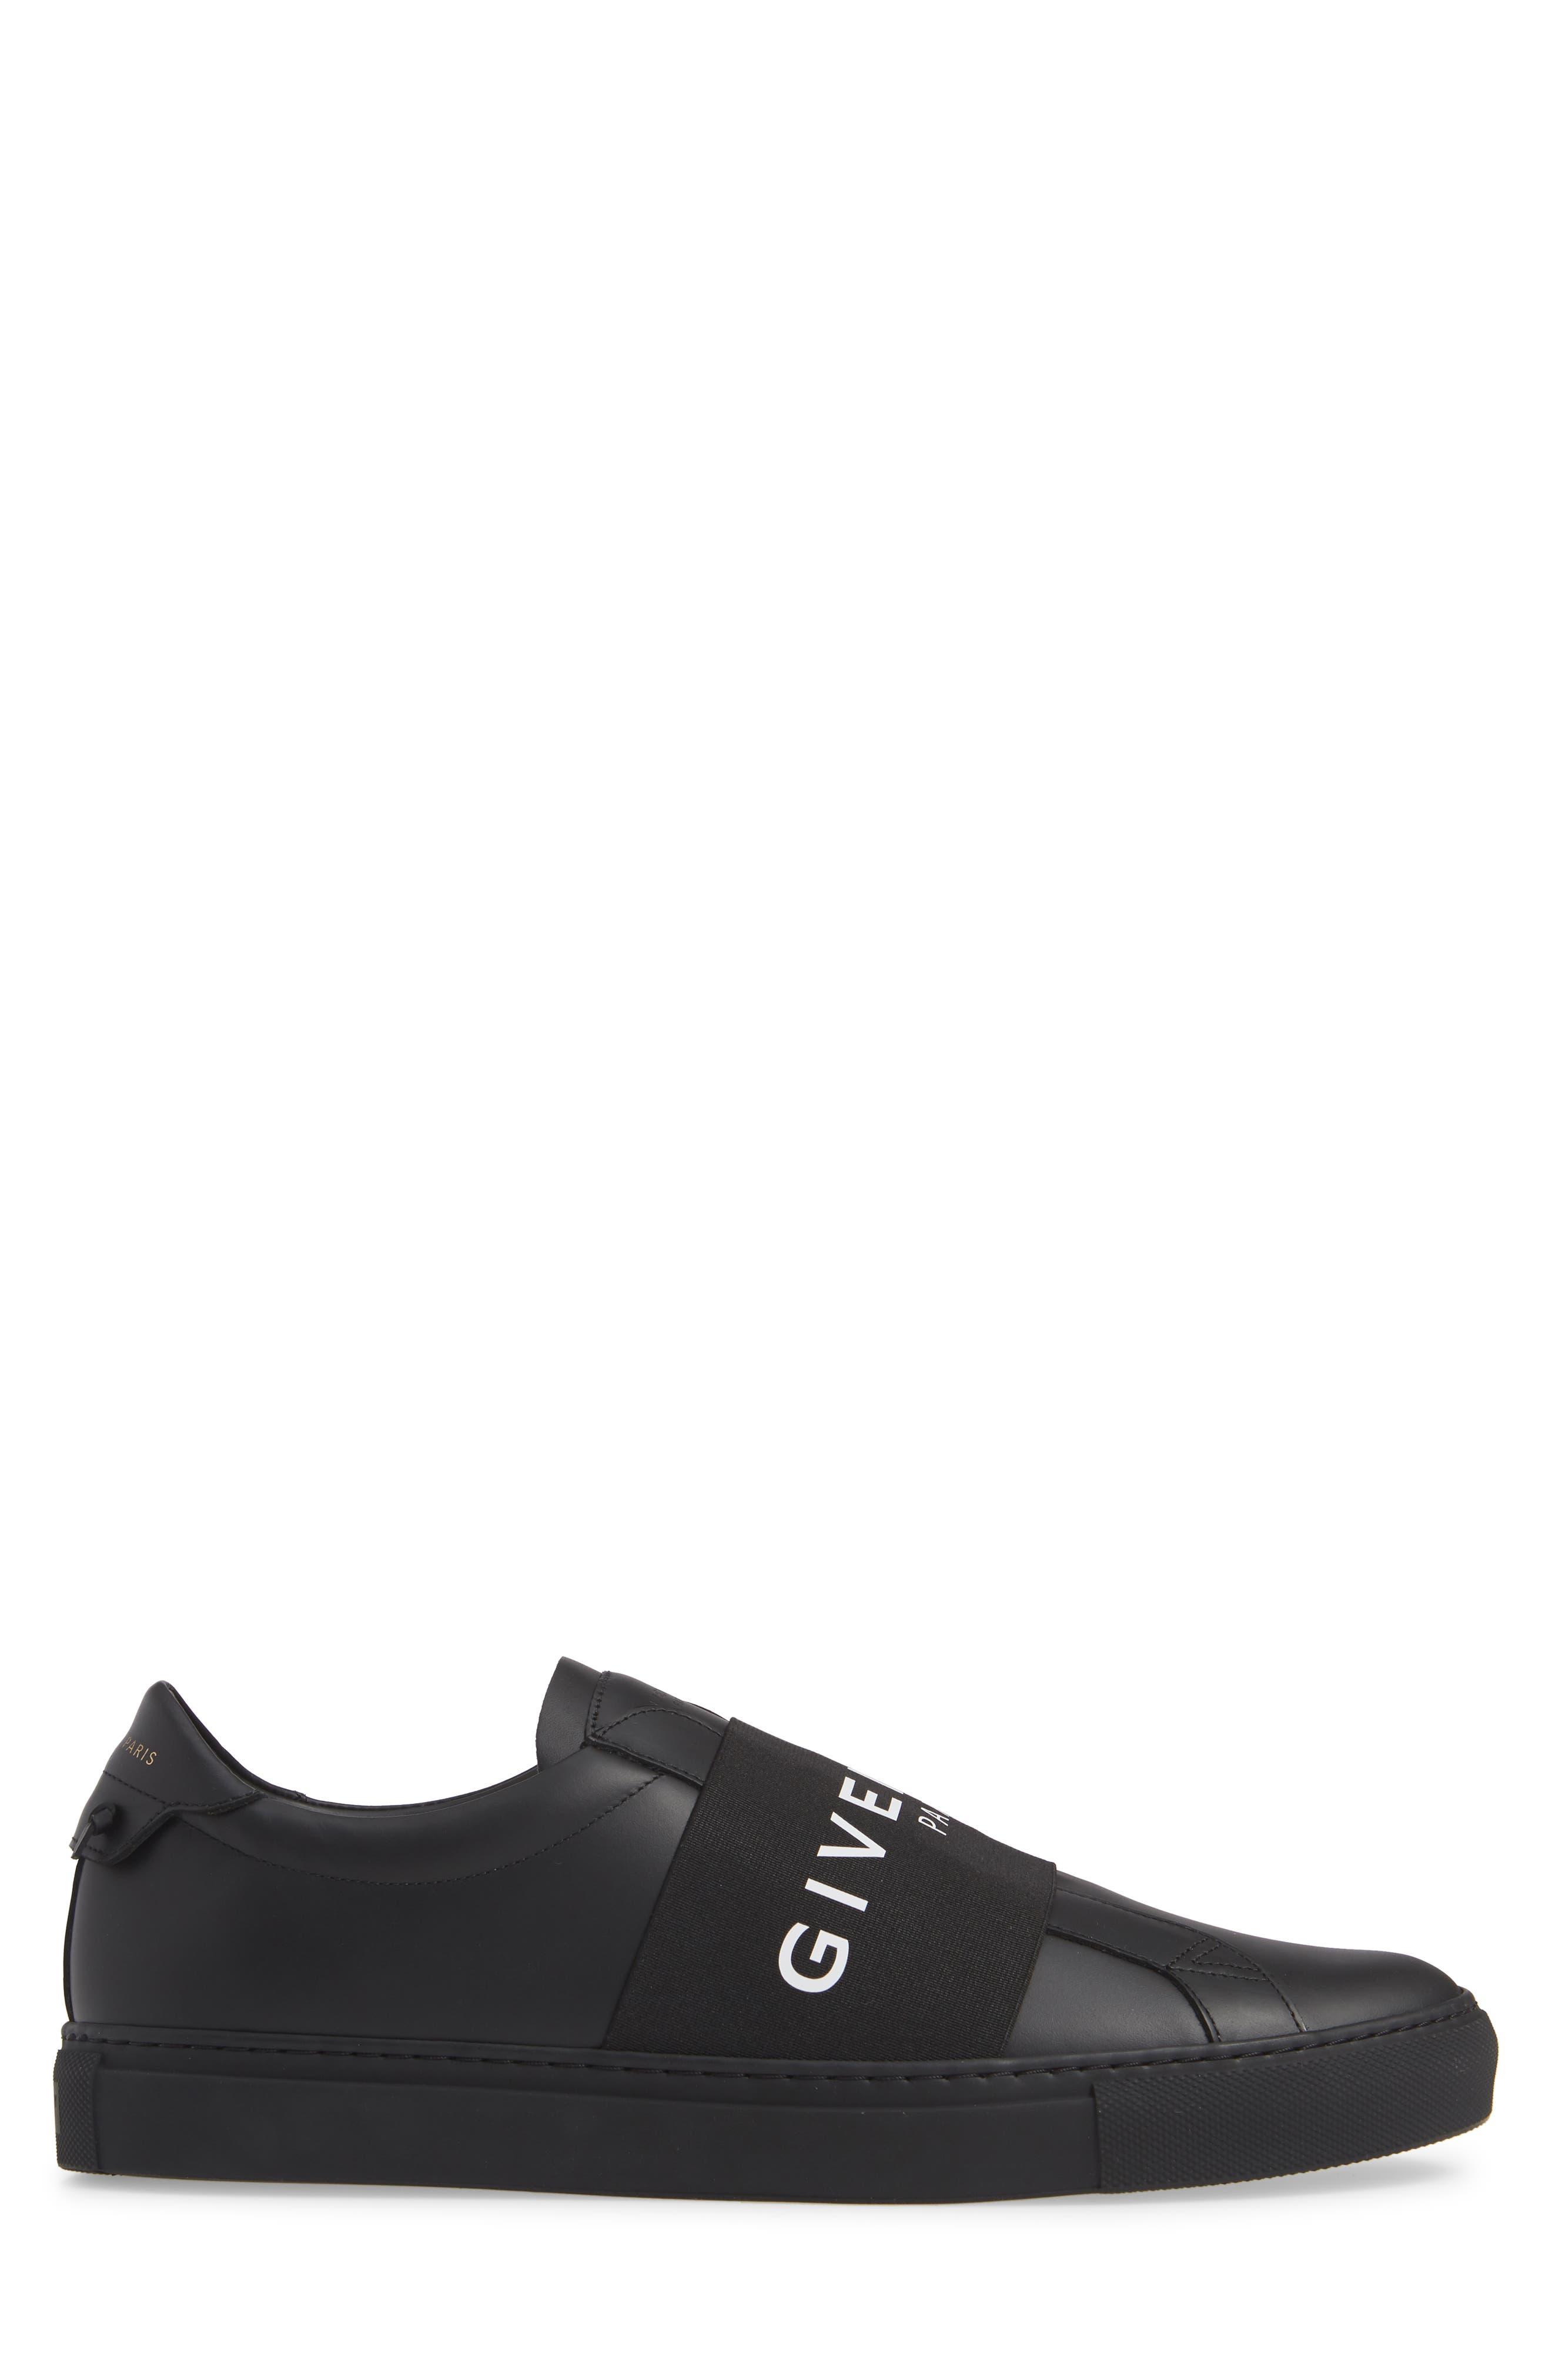 GIVENCHY, Urban Knots Sneaker, Alternate thumbnail 3, color, BLACK